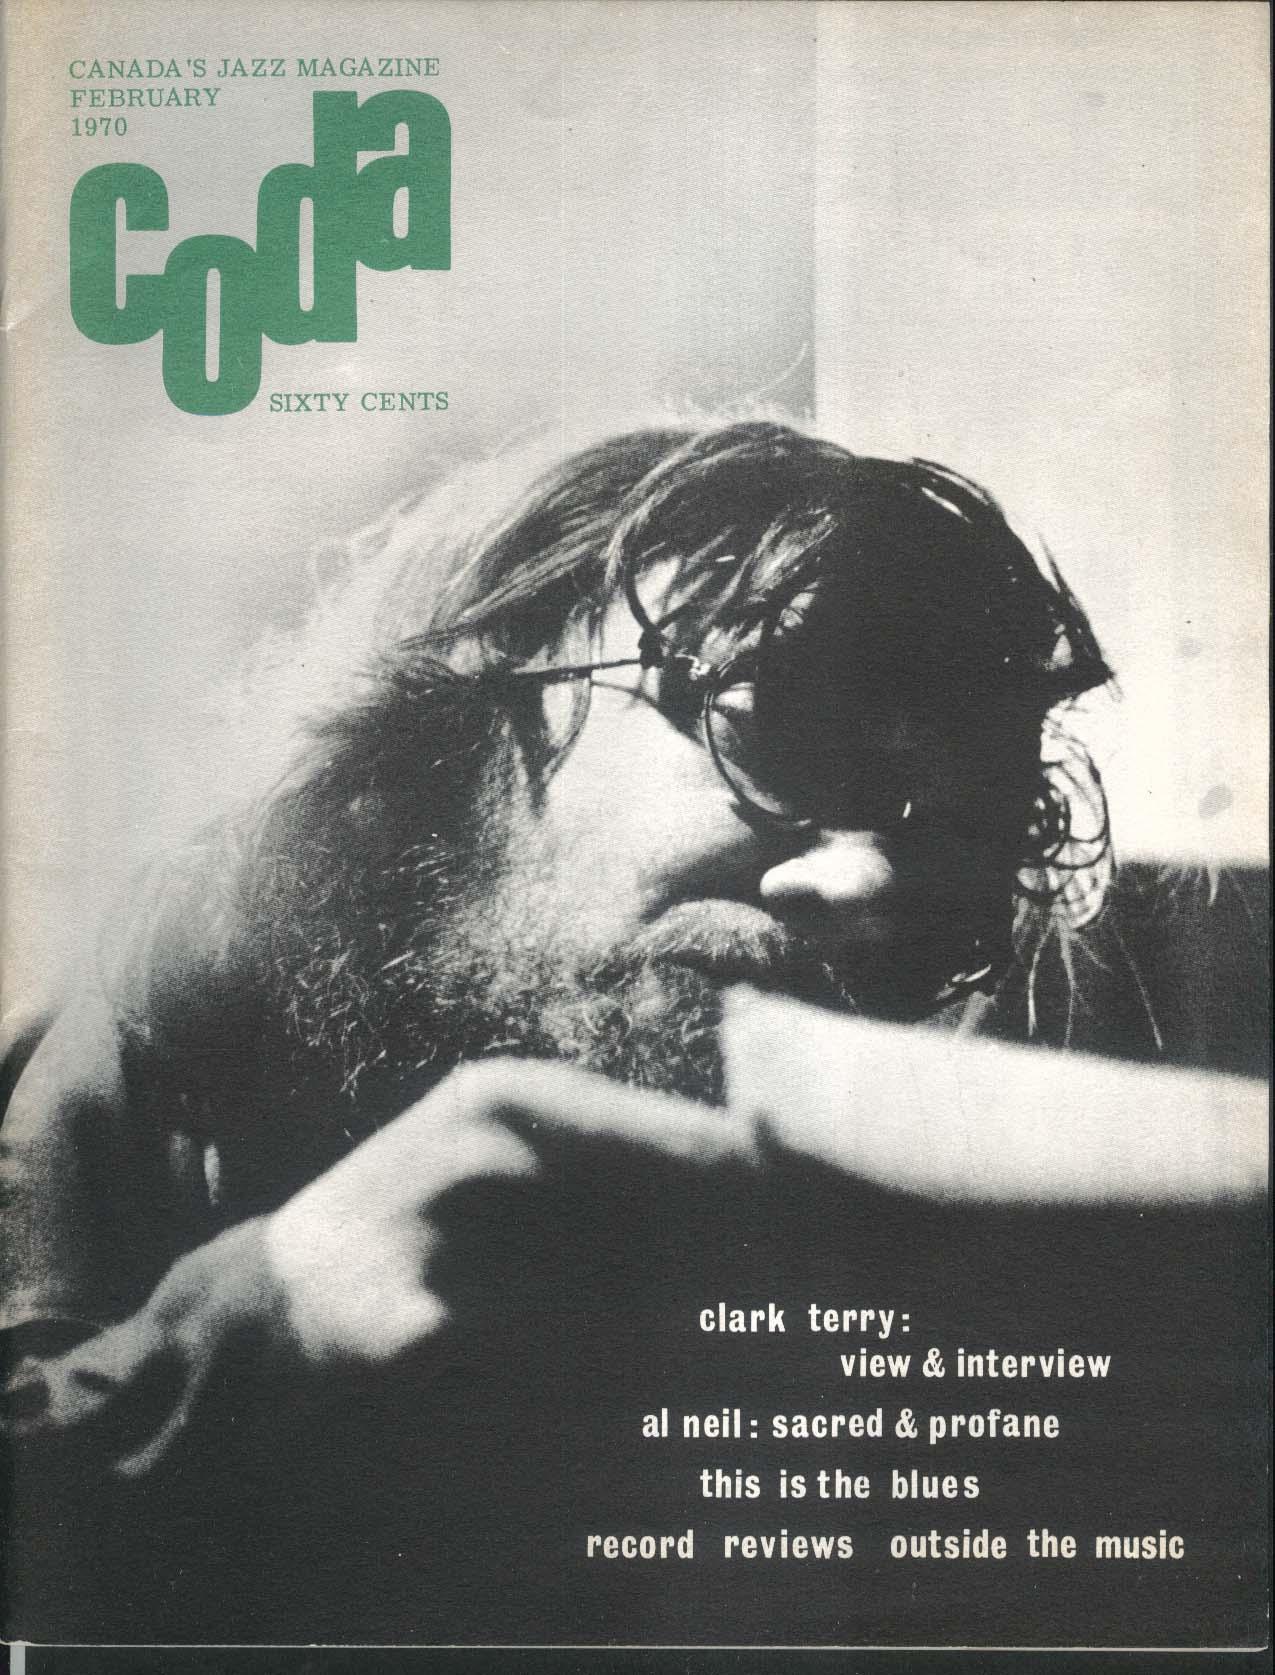 CODA Clark Terry Al Neil Jazz Album Design David Spitzer 2 1970